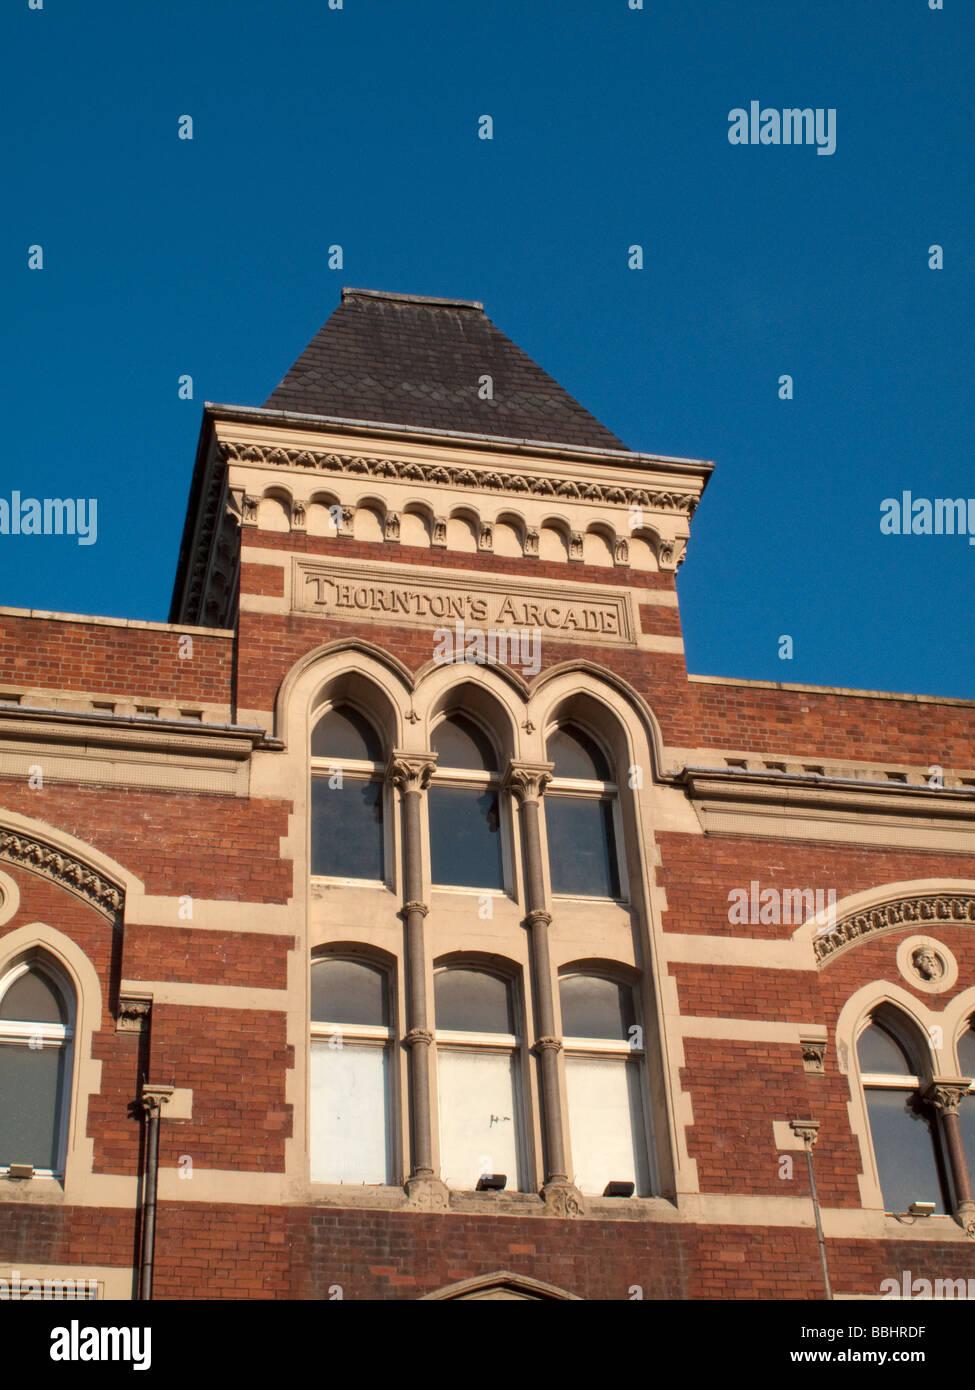 Thorntons Arcade, Leeds, Yorkshire, England, UK - Stock Image